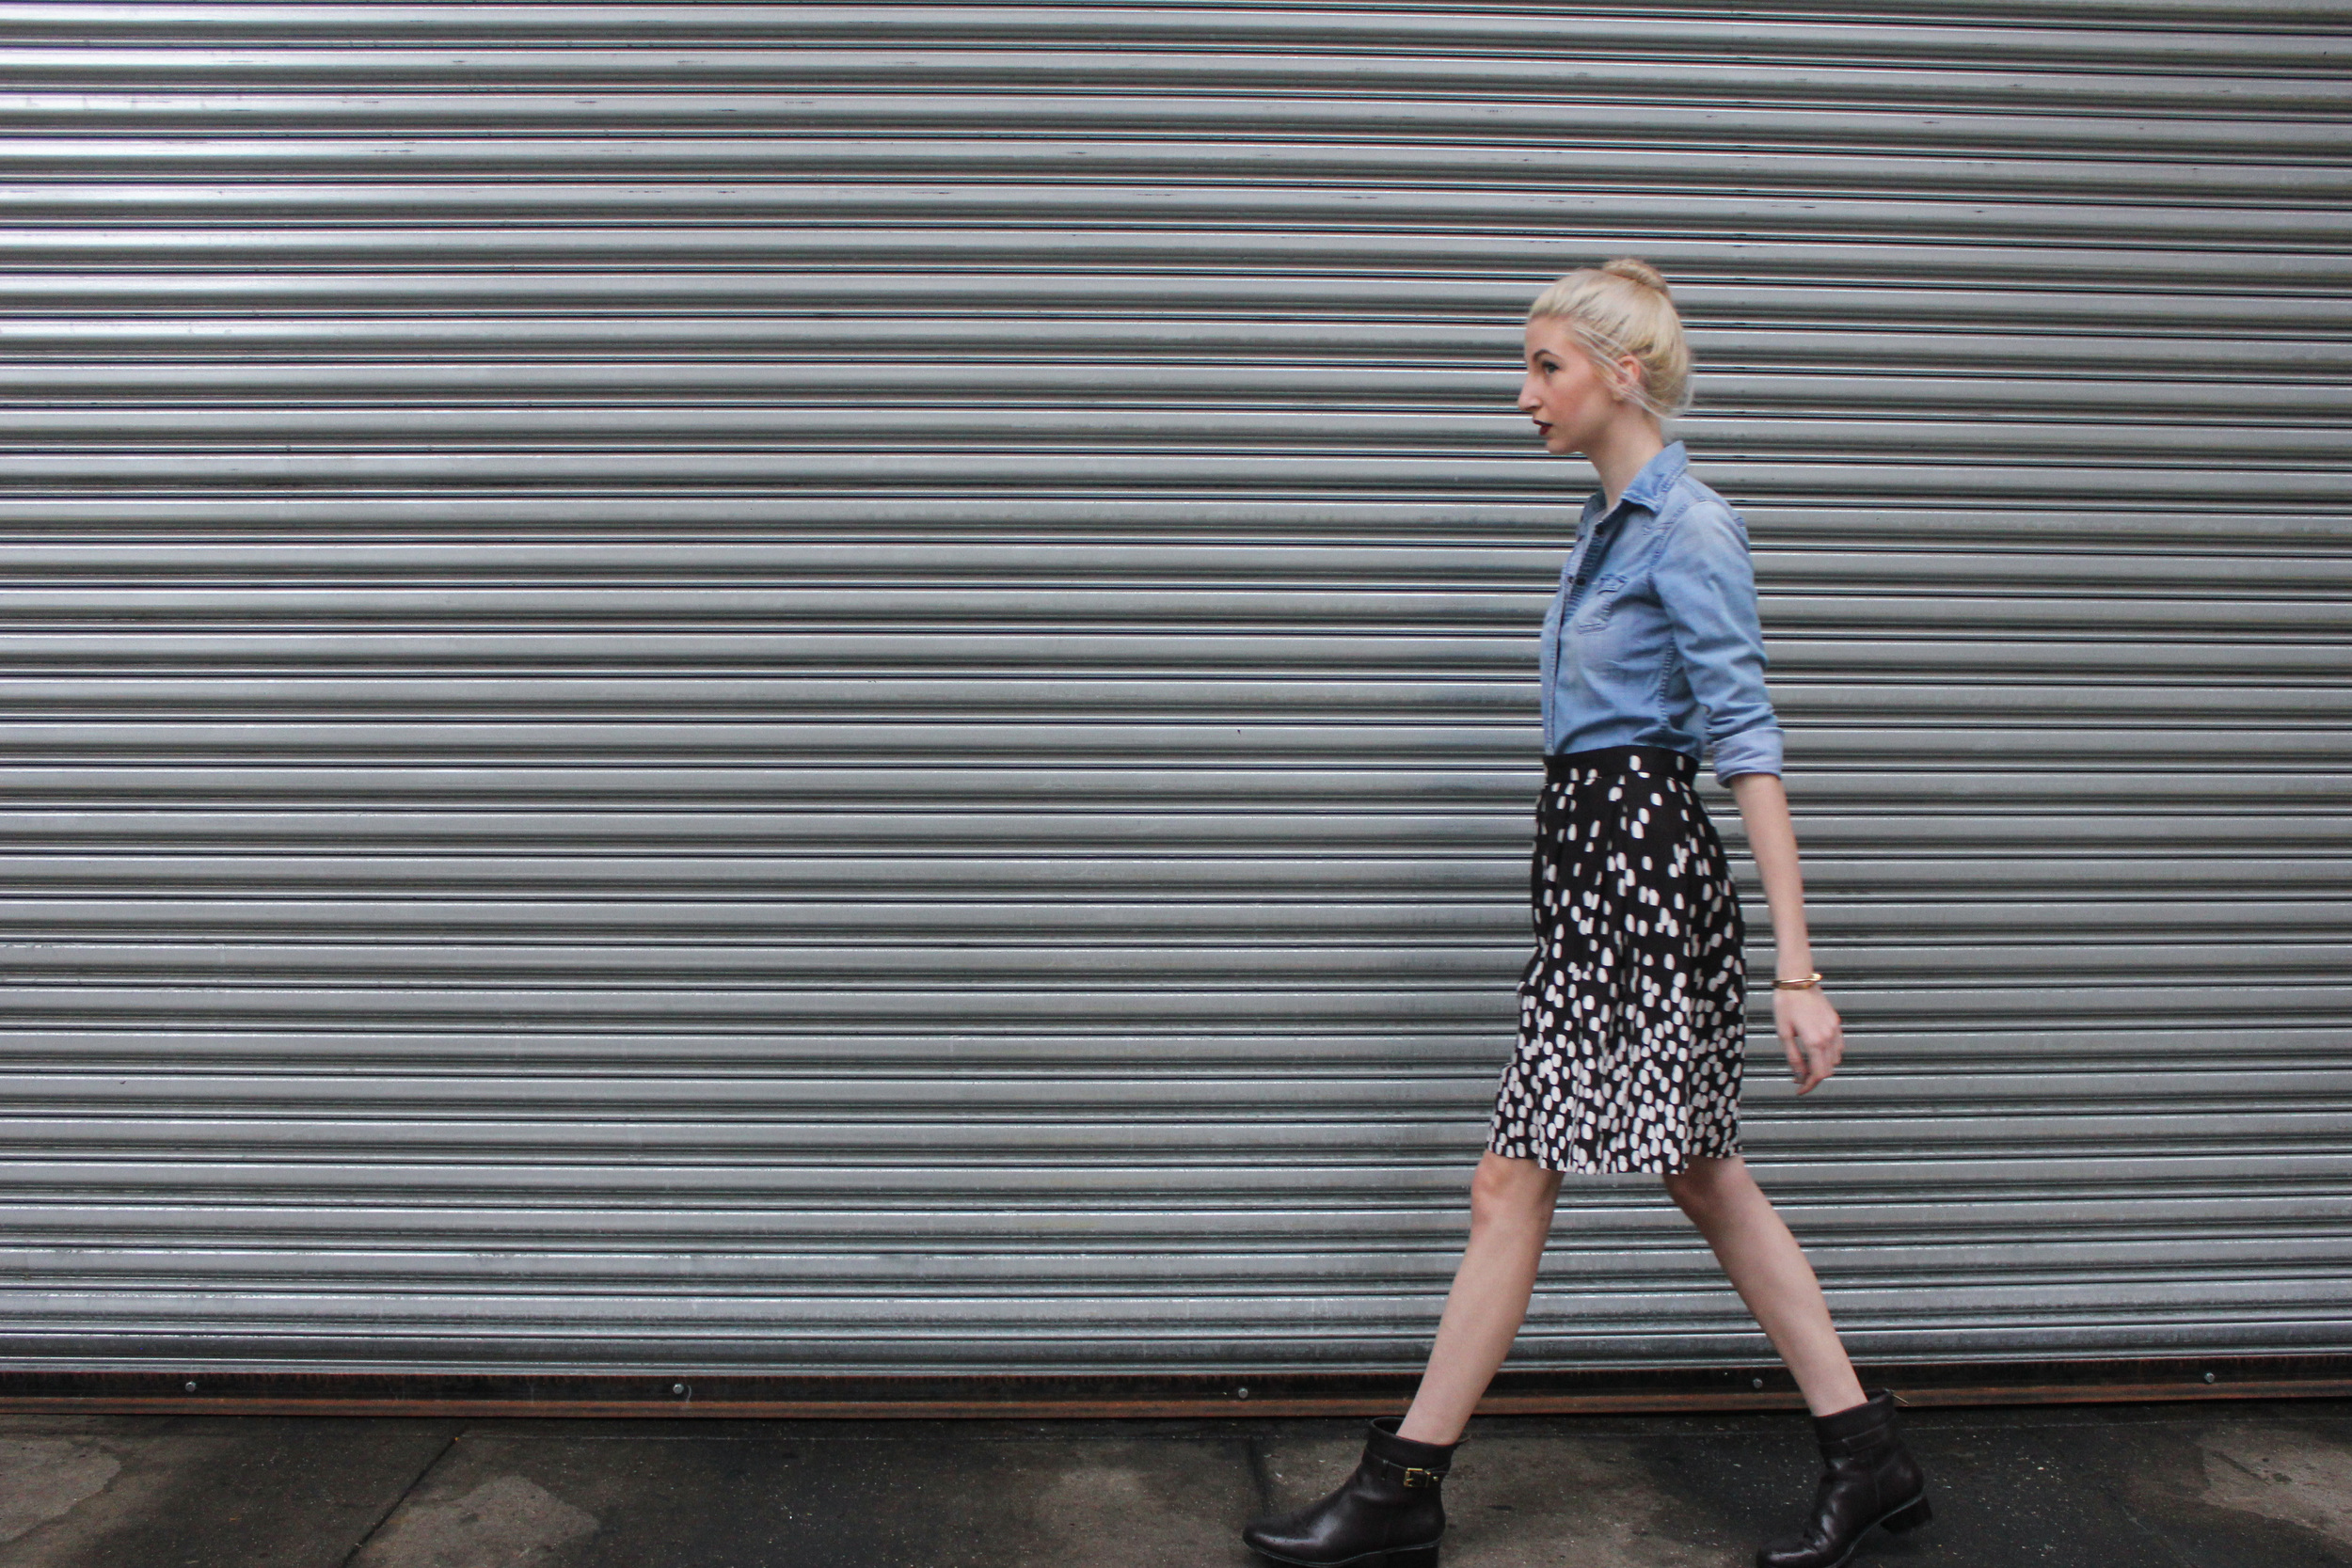 Shirt -  American Eagle  / Skirt - made myself! ( similar ) / Boots - TJ Maxx ( similar ) / Lipstick -  Clinique